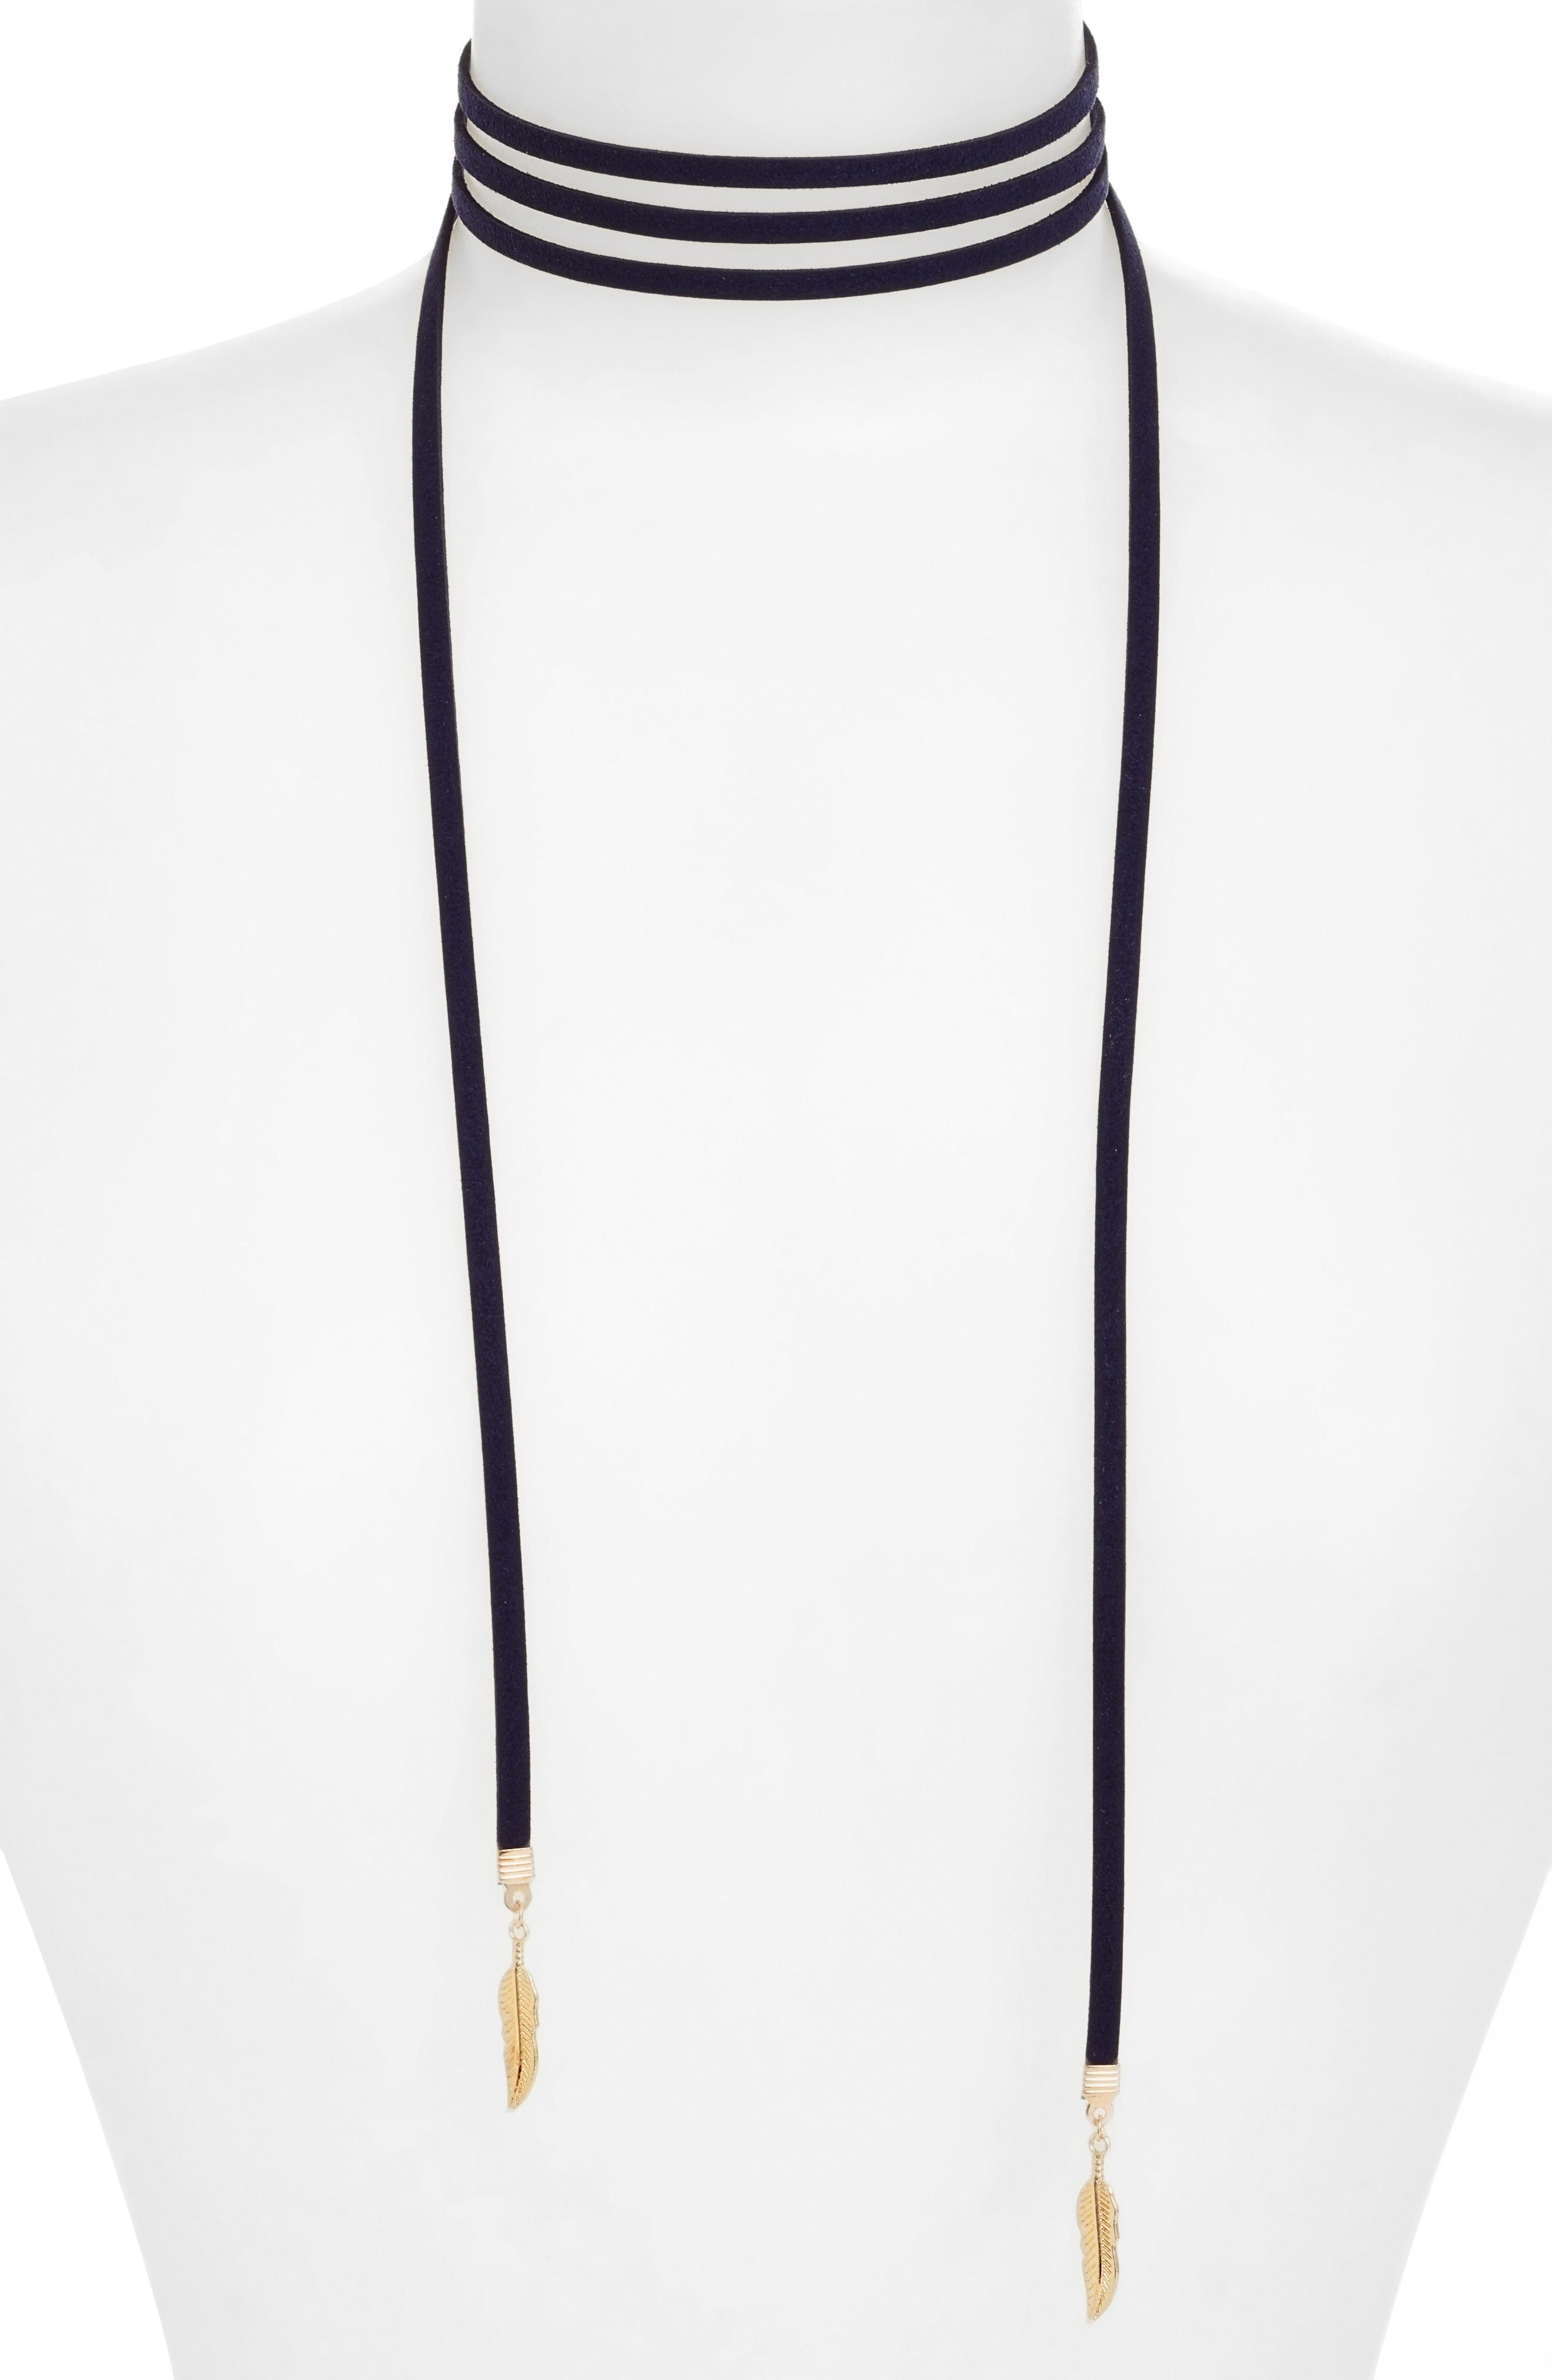 Jules Smith Kale Wrap Choker Necklace